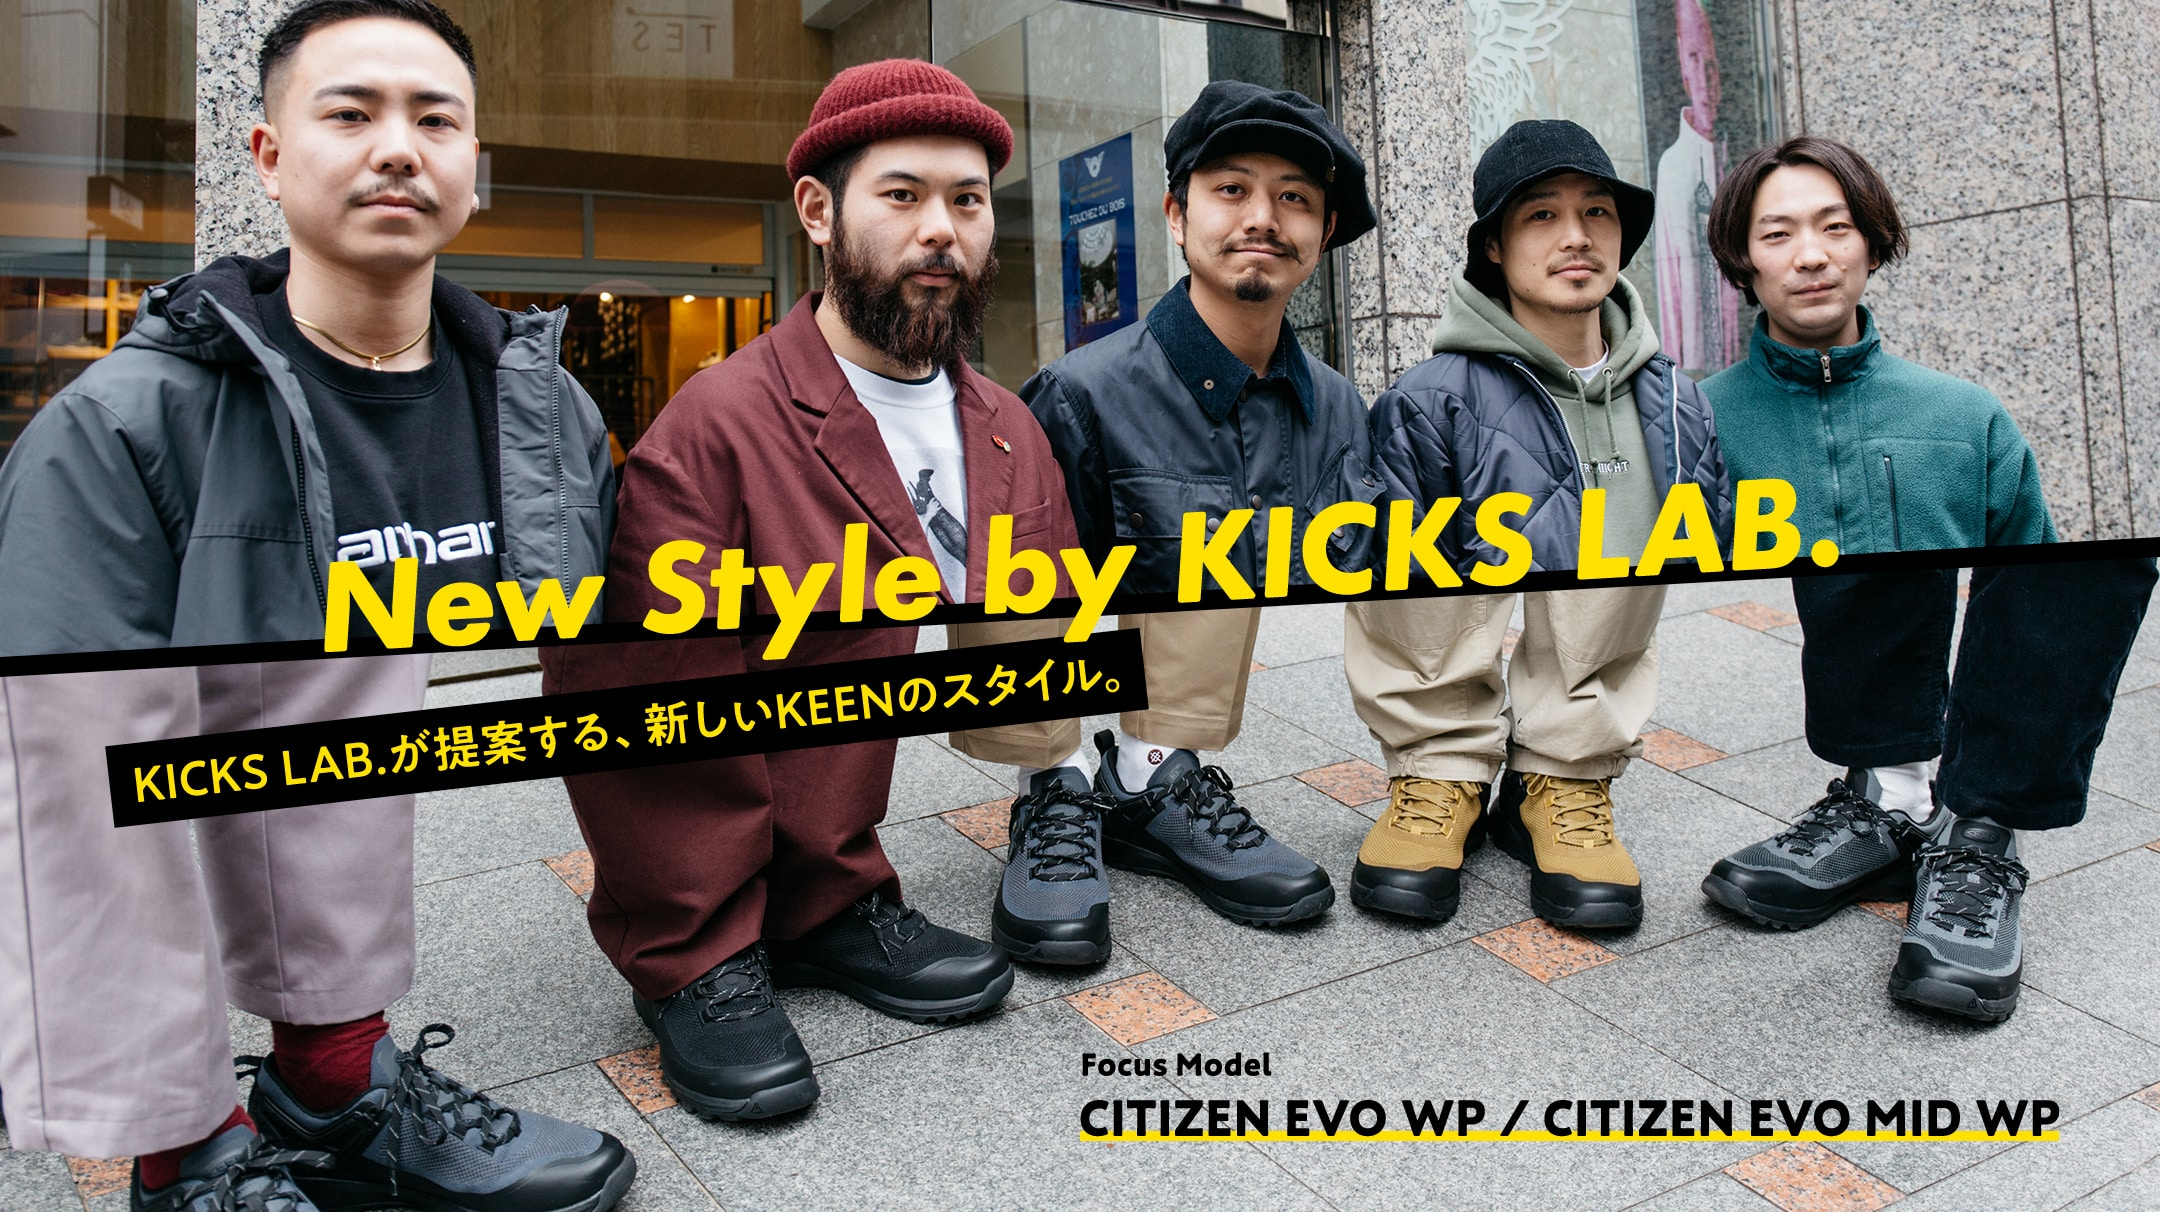 KICKS LAB.が提案する、新しいKEENのスタイル。